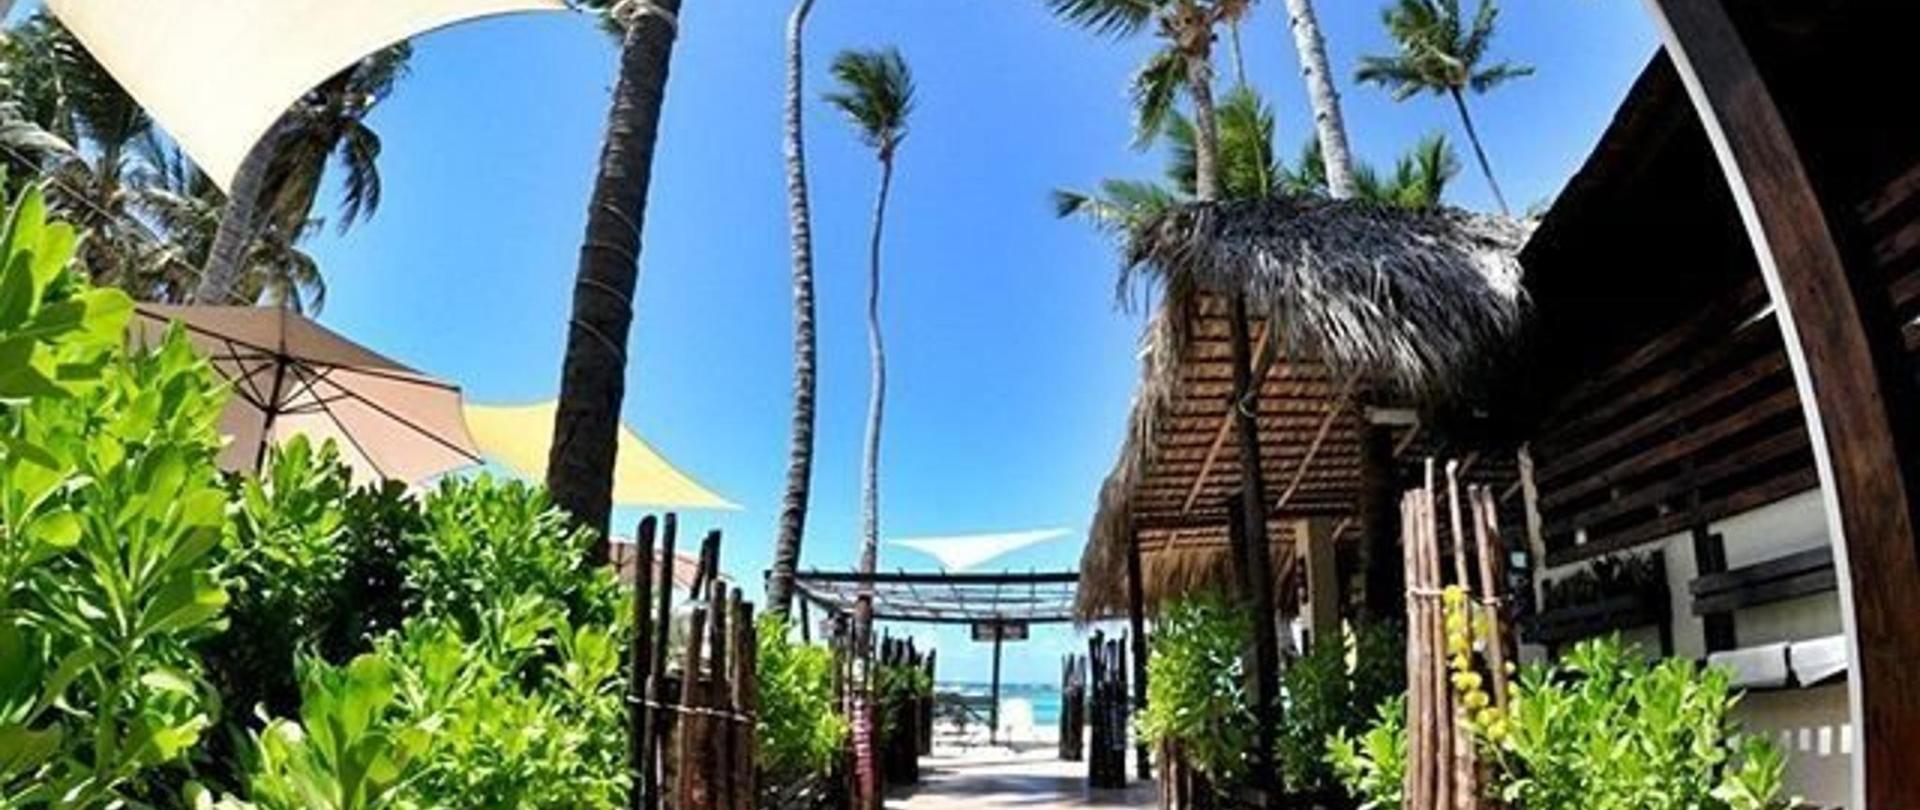 Capri Beach House - Punta Cana - Dominican Republic